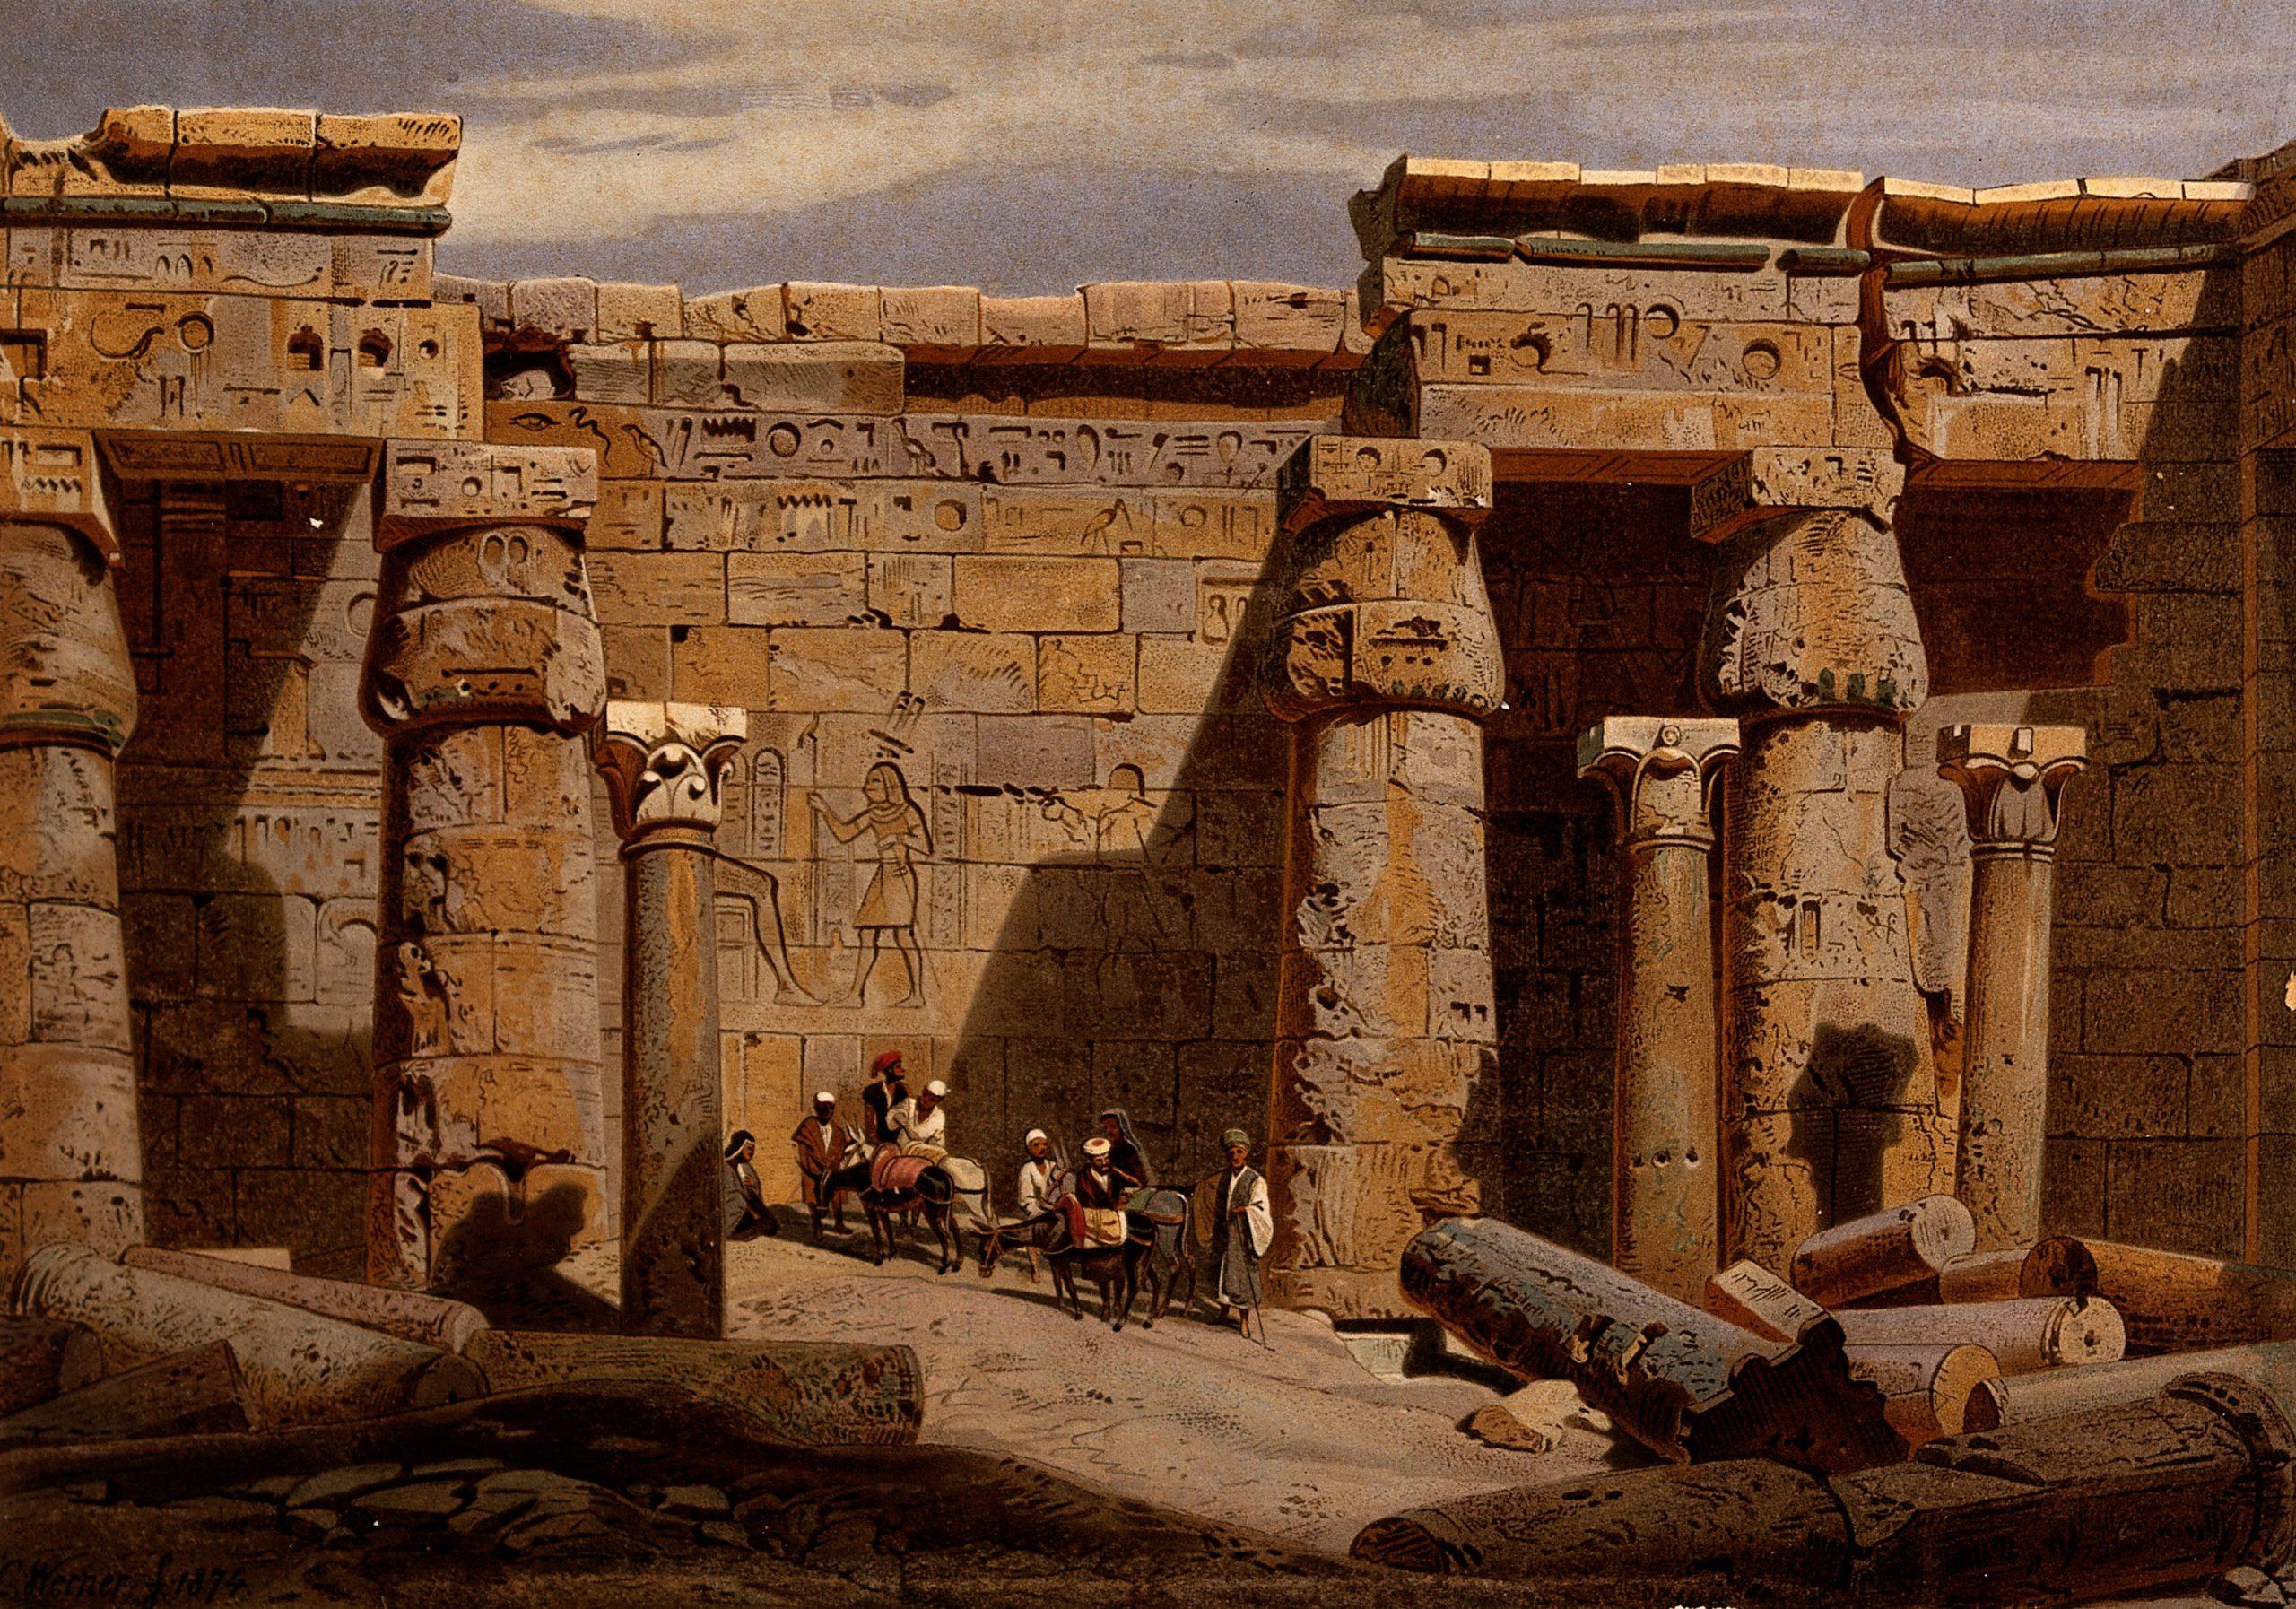 Egypt: court of the Medinet-Habu temple - Carl Werner, 1874